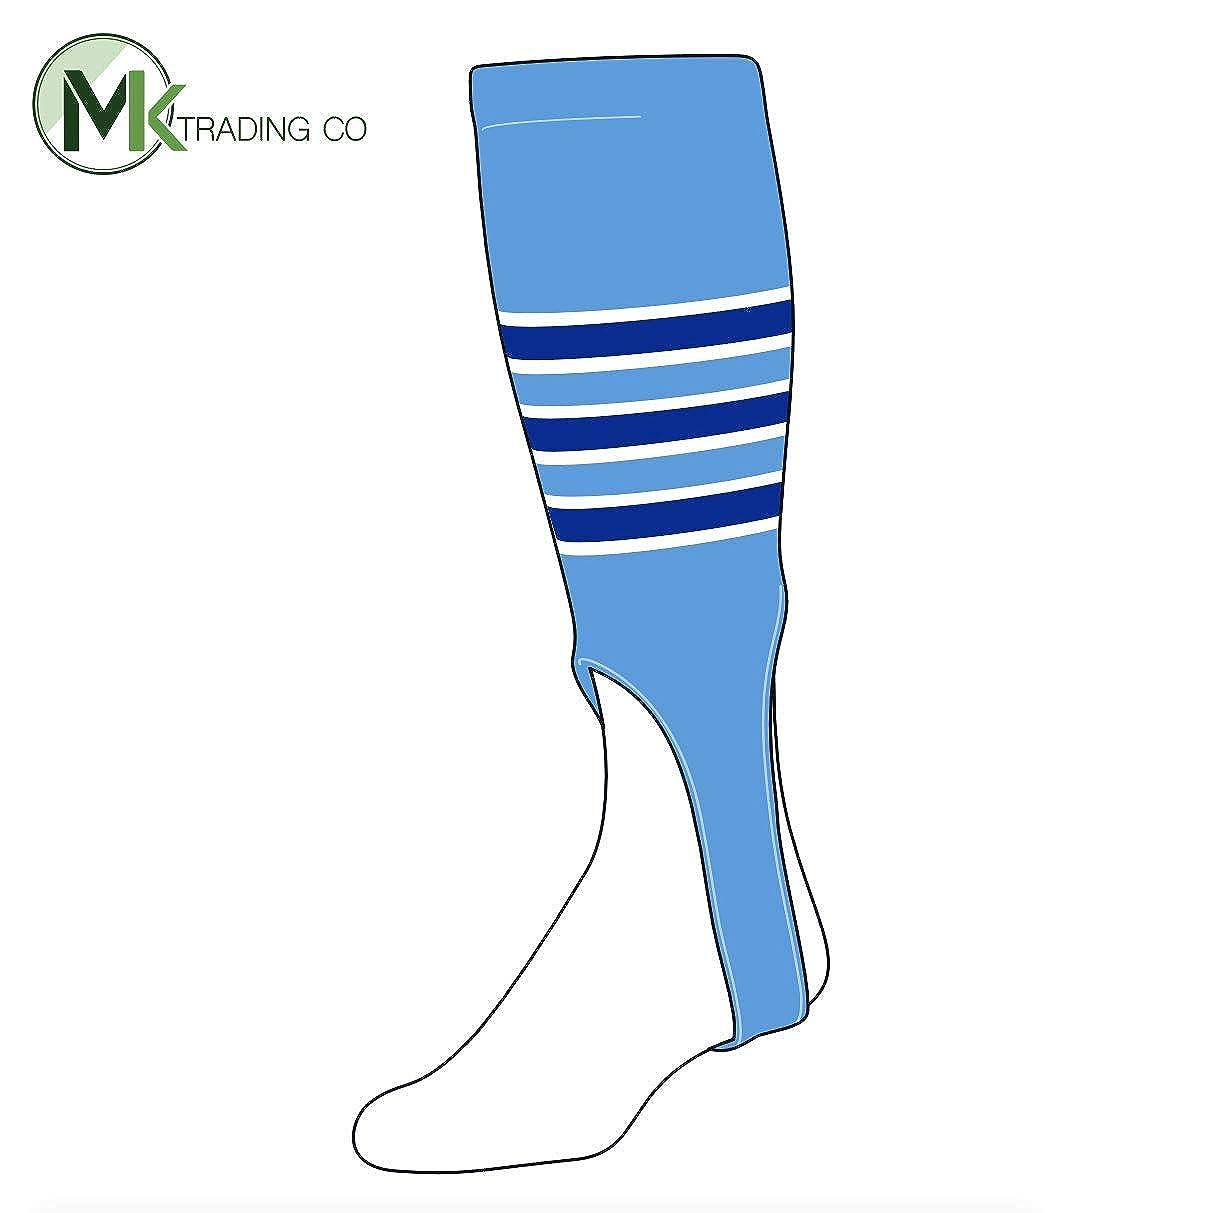 TCK Socks SOCKSHOSIERY メンズ US US B07MVNBGJ6 サイズ: サイズ: Large 19 inch (16+ years) B07MVNBGJ6, 和-closet 浅野屋呉服店:857a0336 --- cgt-tbc.fr